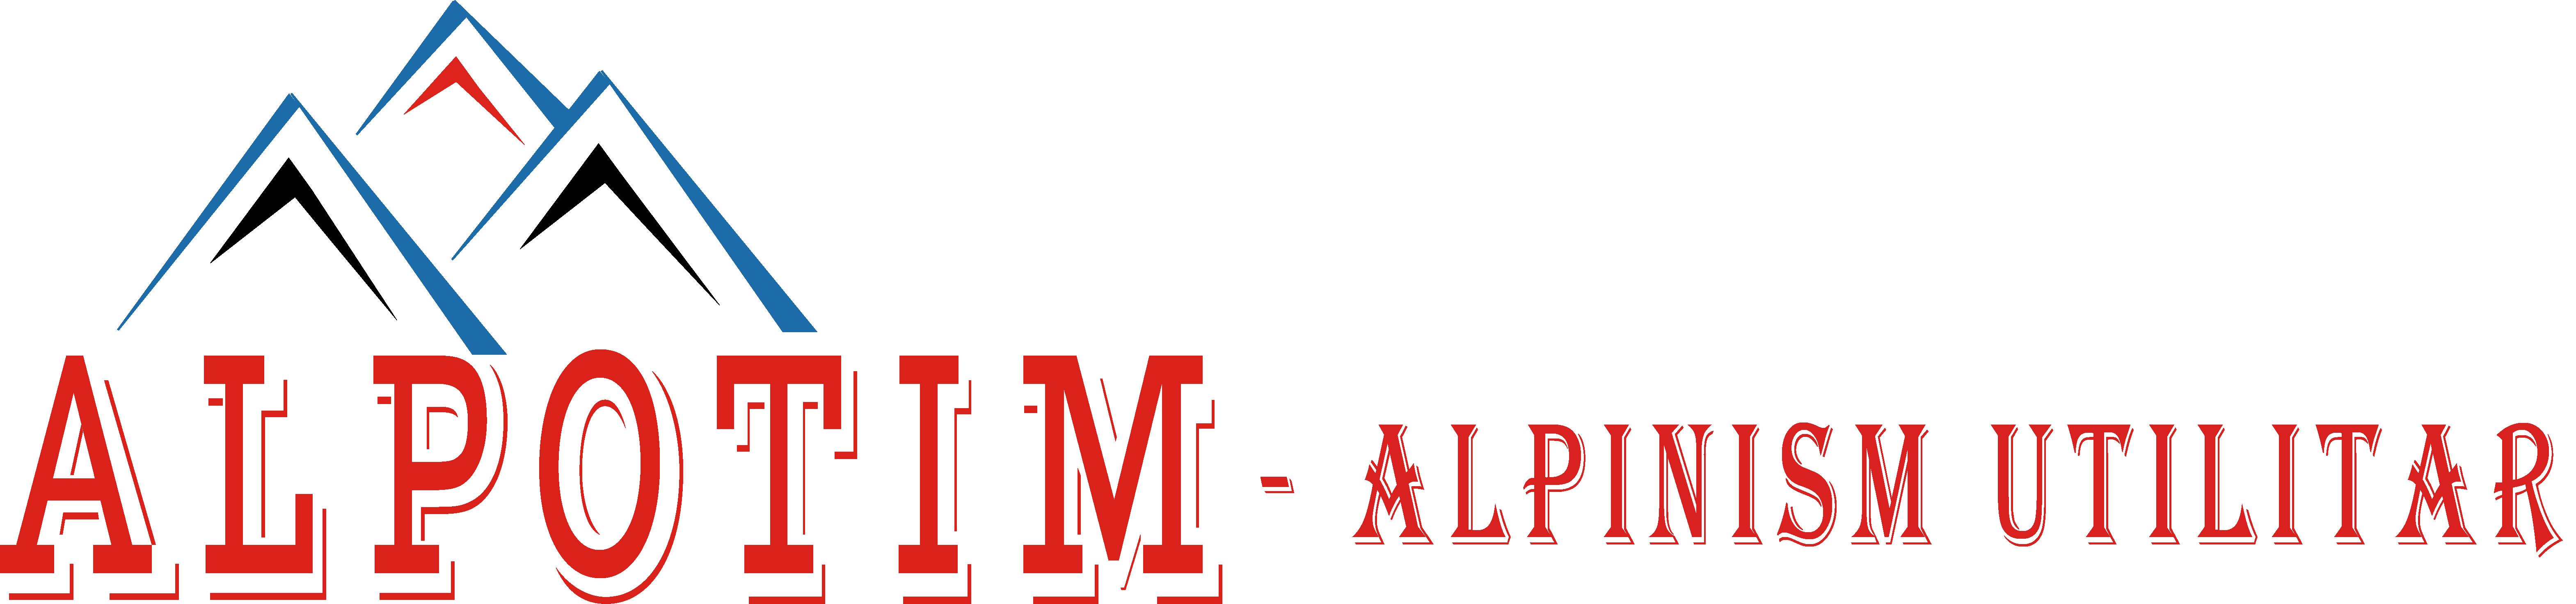 Alpotim-Alpinism utilitar